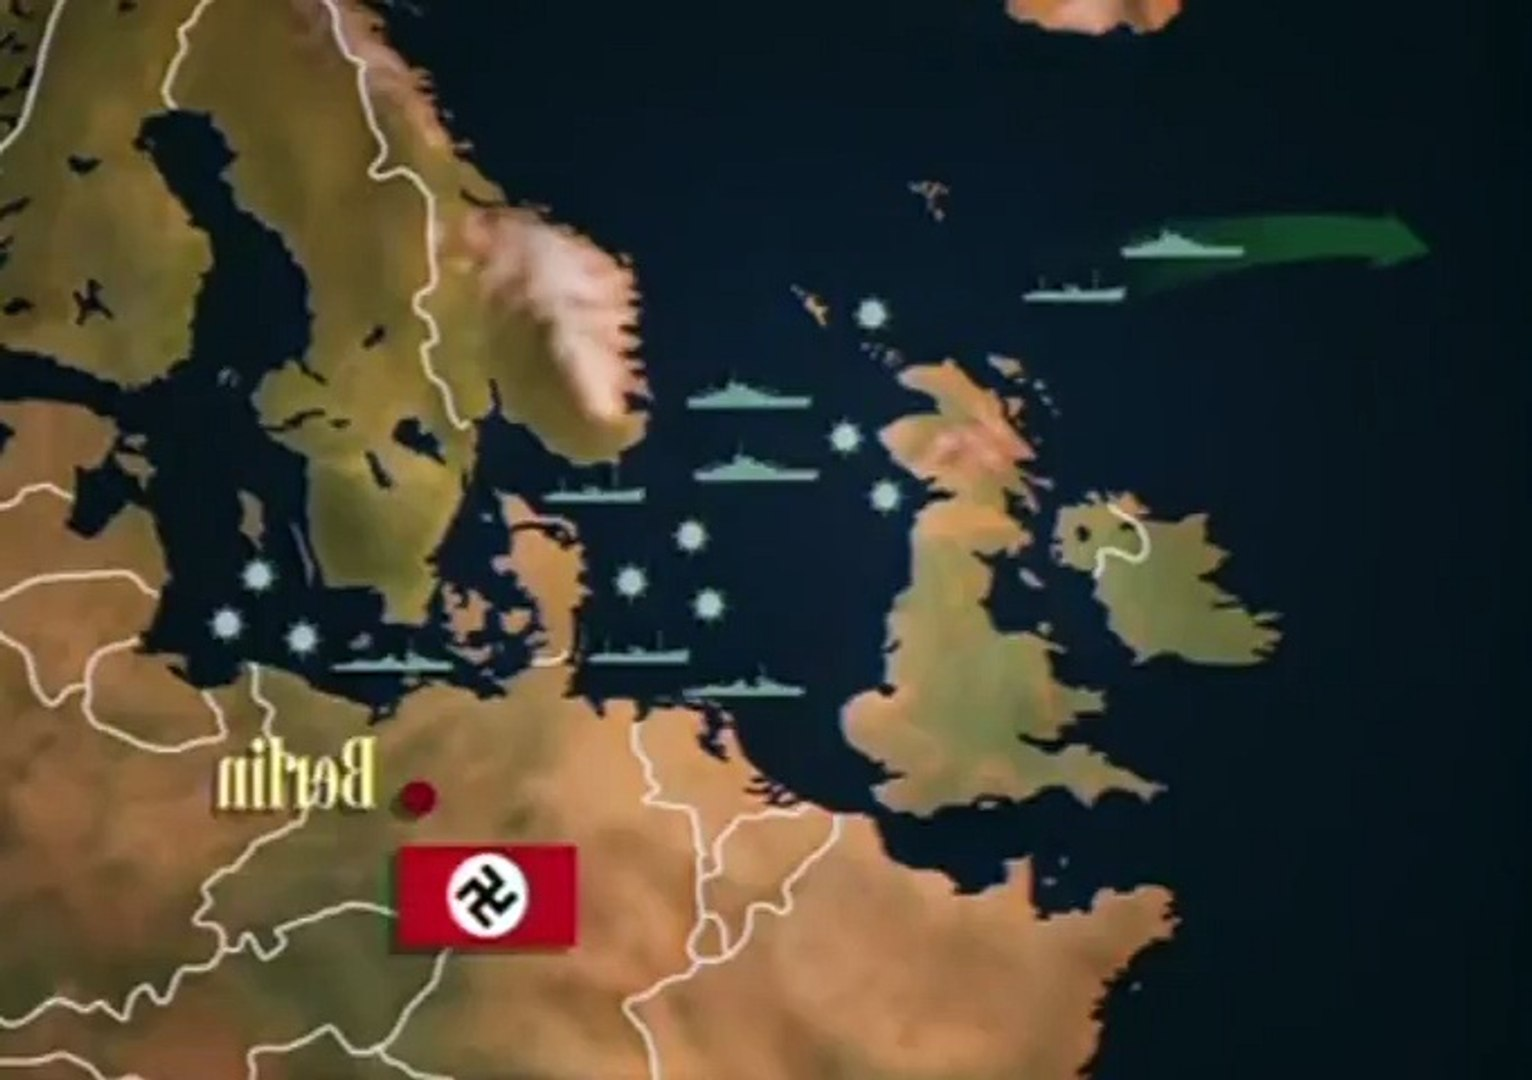 Battlefield S02 - Ep02 The Battle of the Atlantic - Part 01 HD Watch